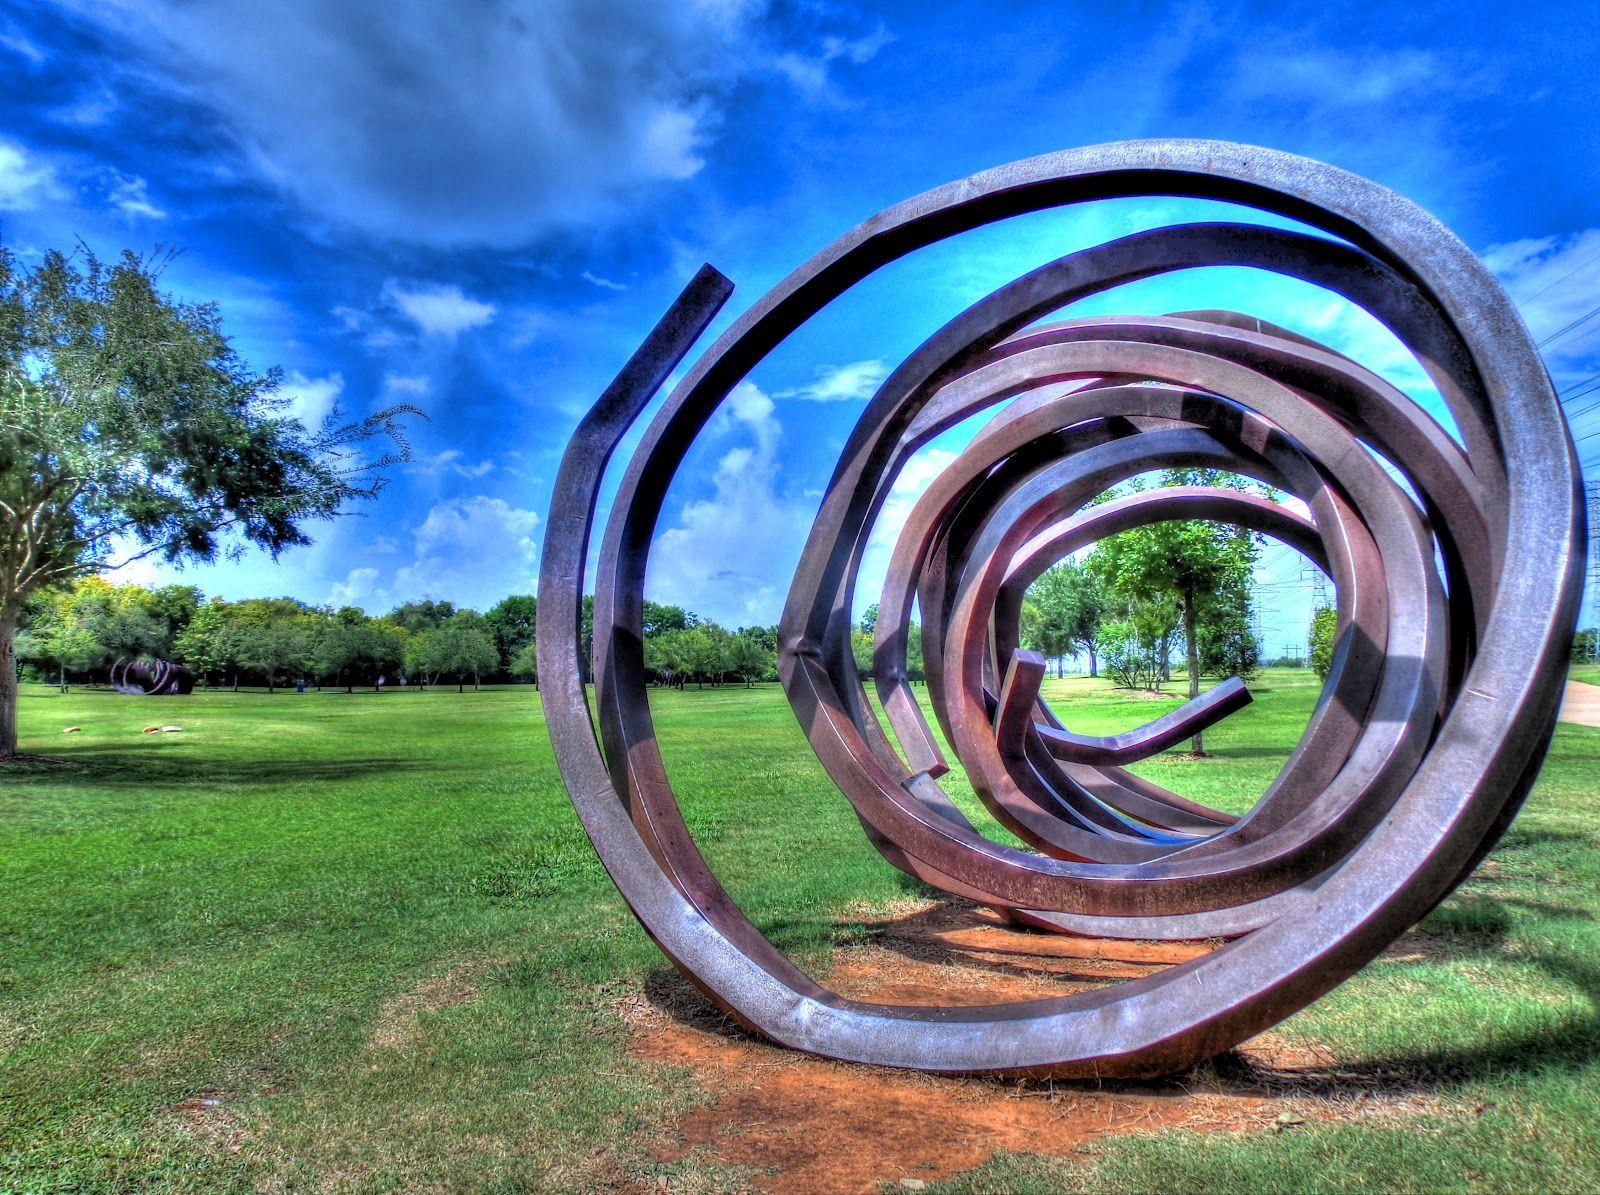 best ideas about sugar land sugar land texas spiral 1 iron art work oyster creek park sugar land texas